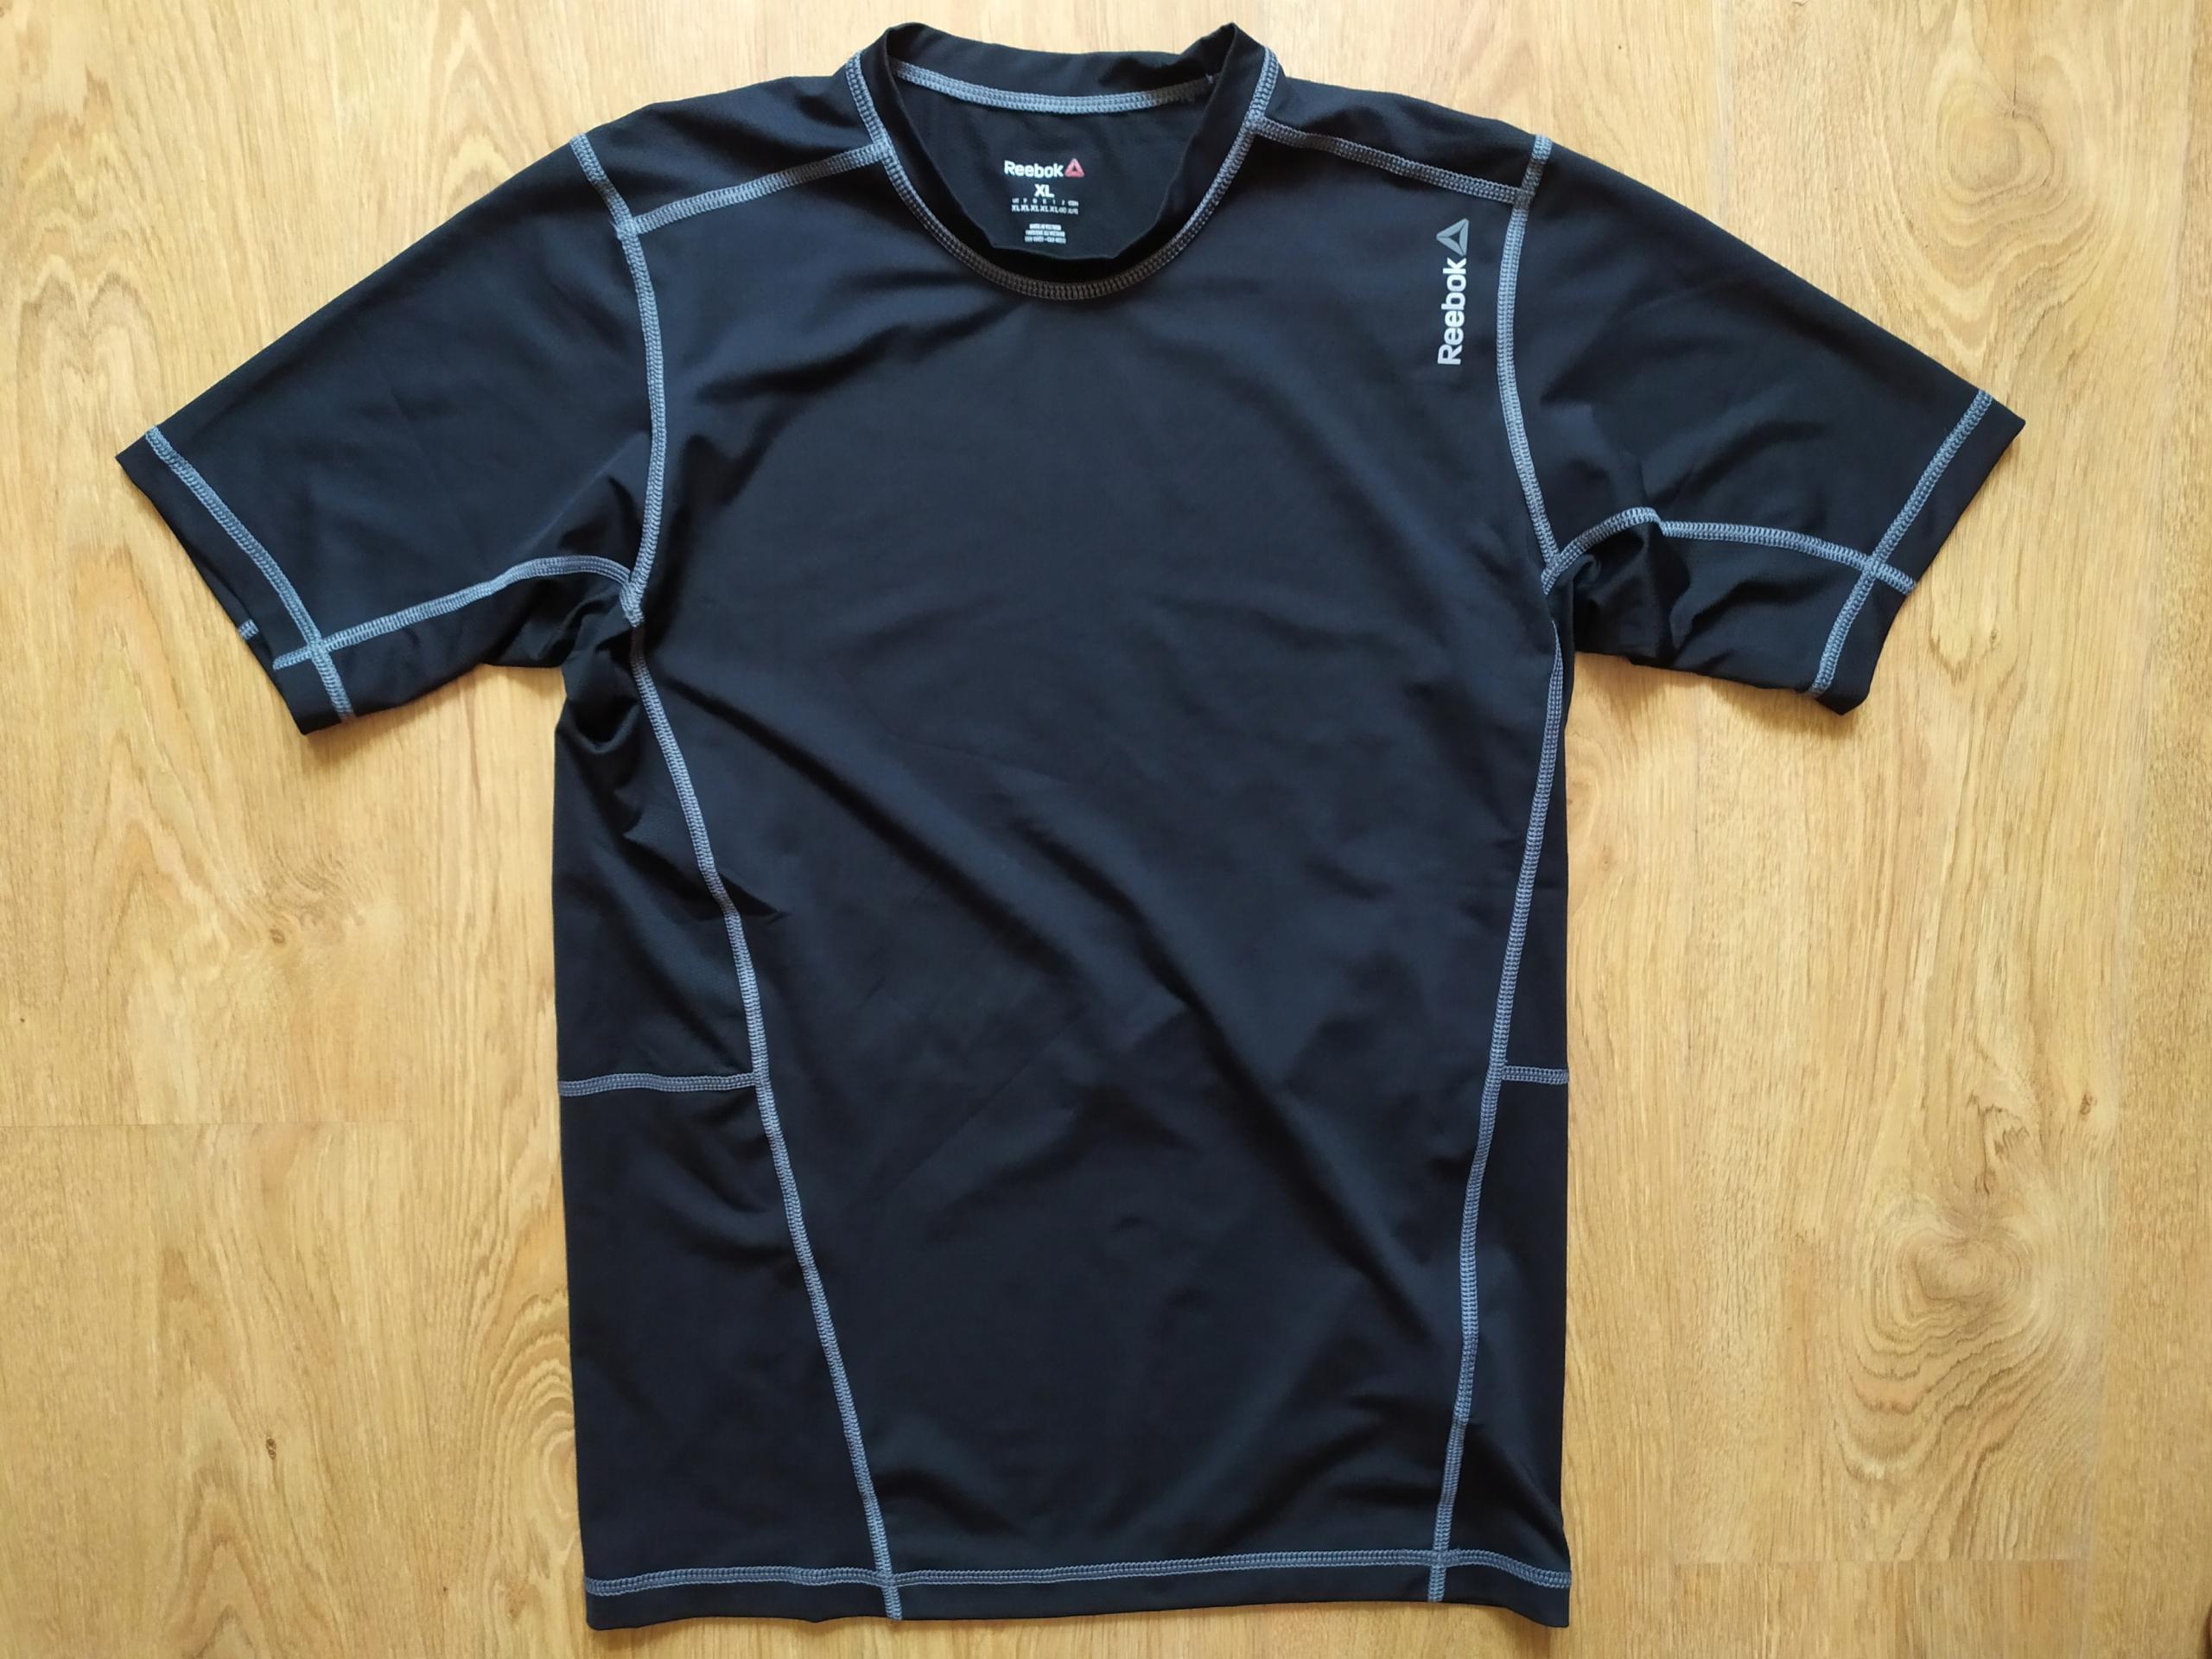 koszulka Reebok Speedwick XL Crossfit jNOWA